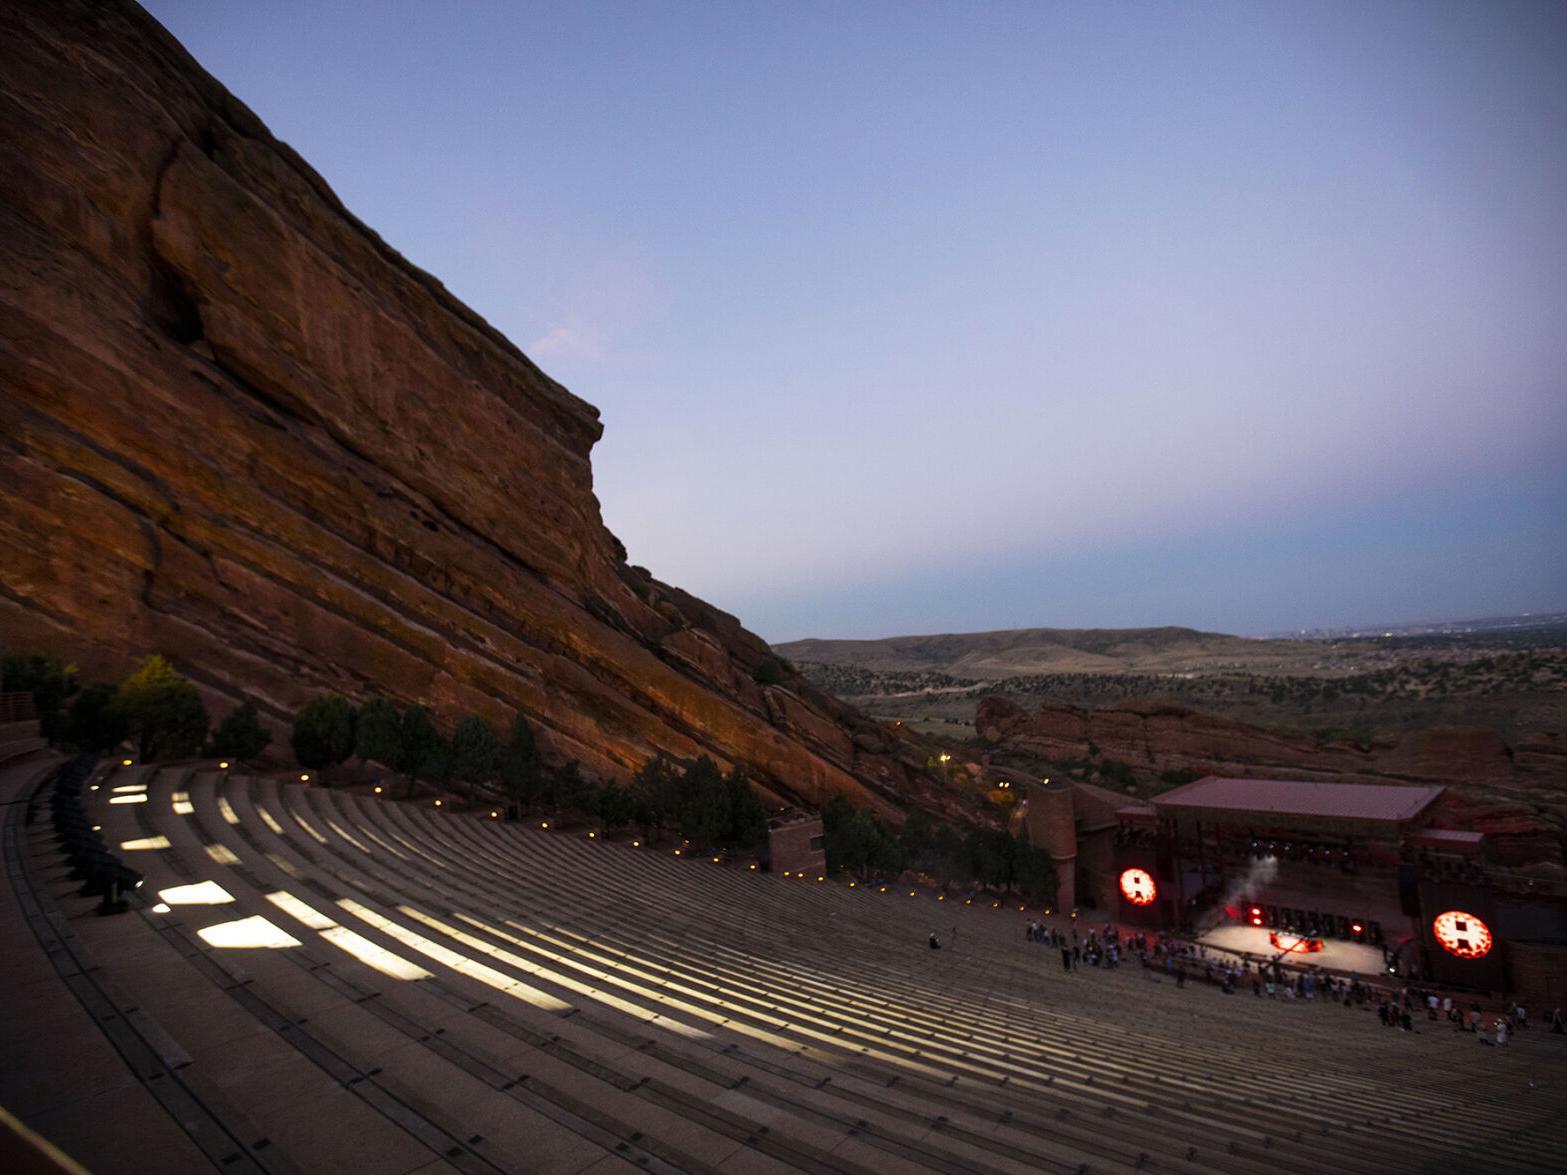 Red Rocks Calendar 2022.Red Rocks Amphitheatre Increases Capacity 2021 Concert Schedule Keeps Growing Arts Entertainment Gazette Com